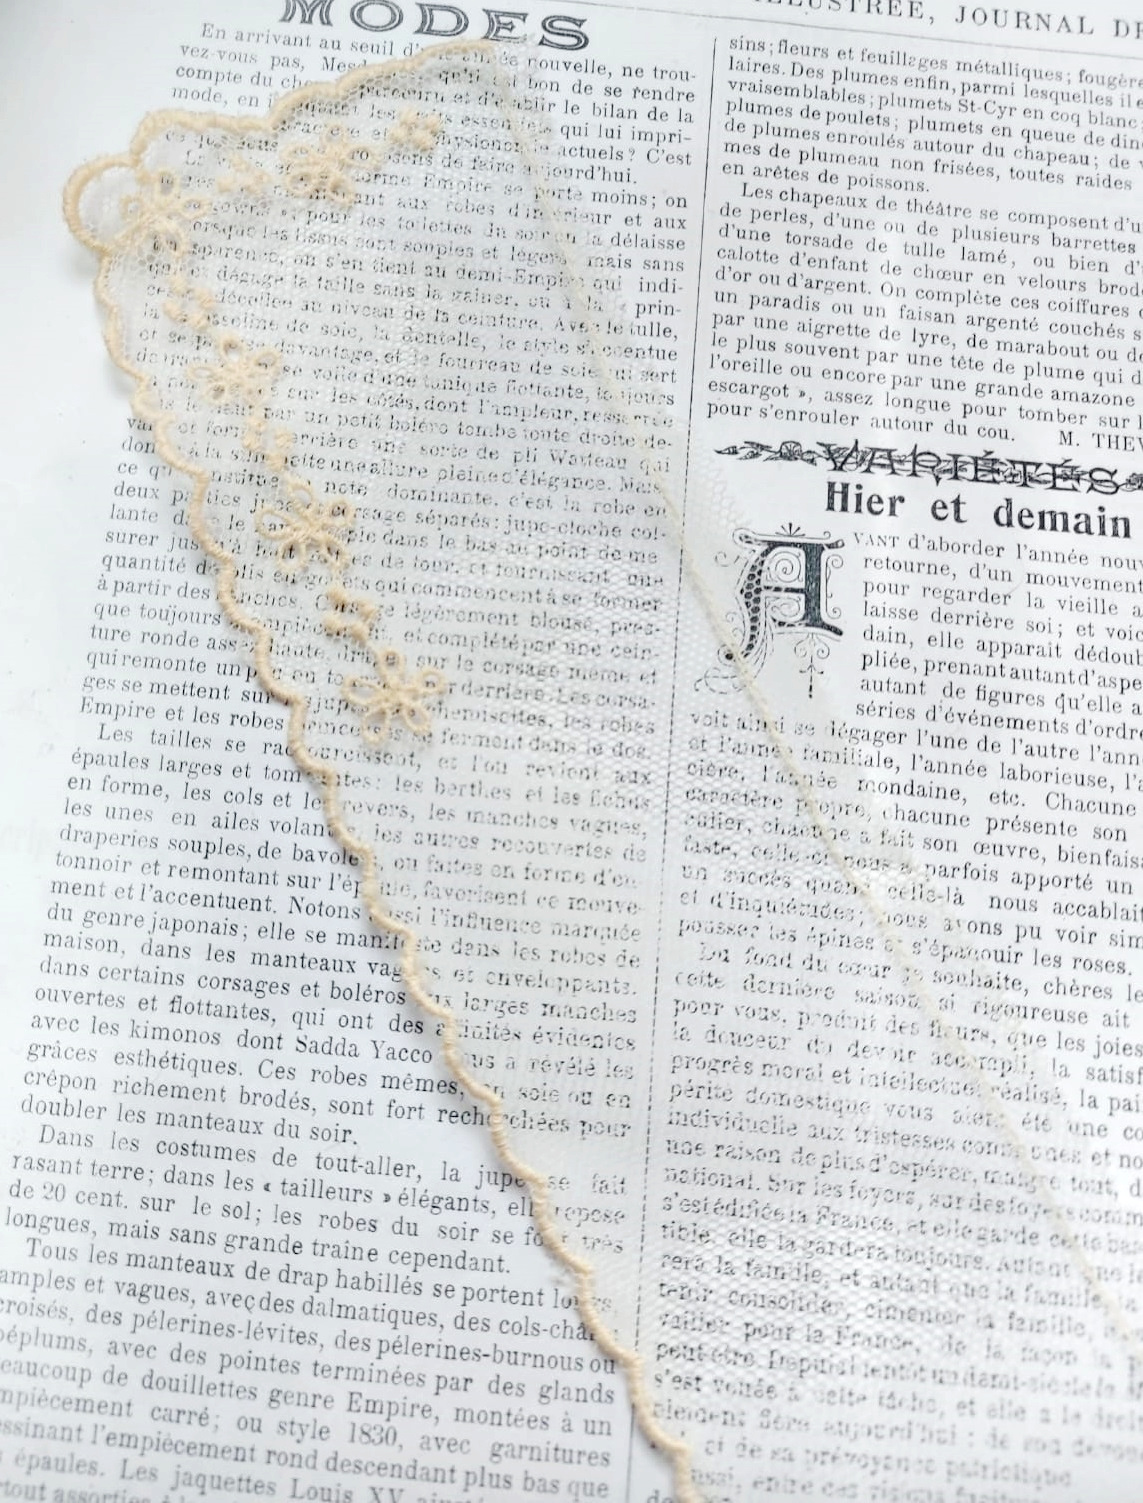 Antique Edwardian Lace Collar